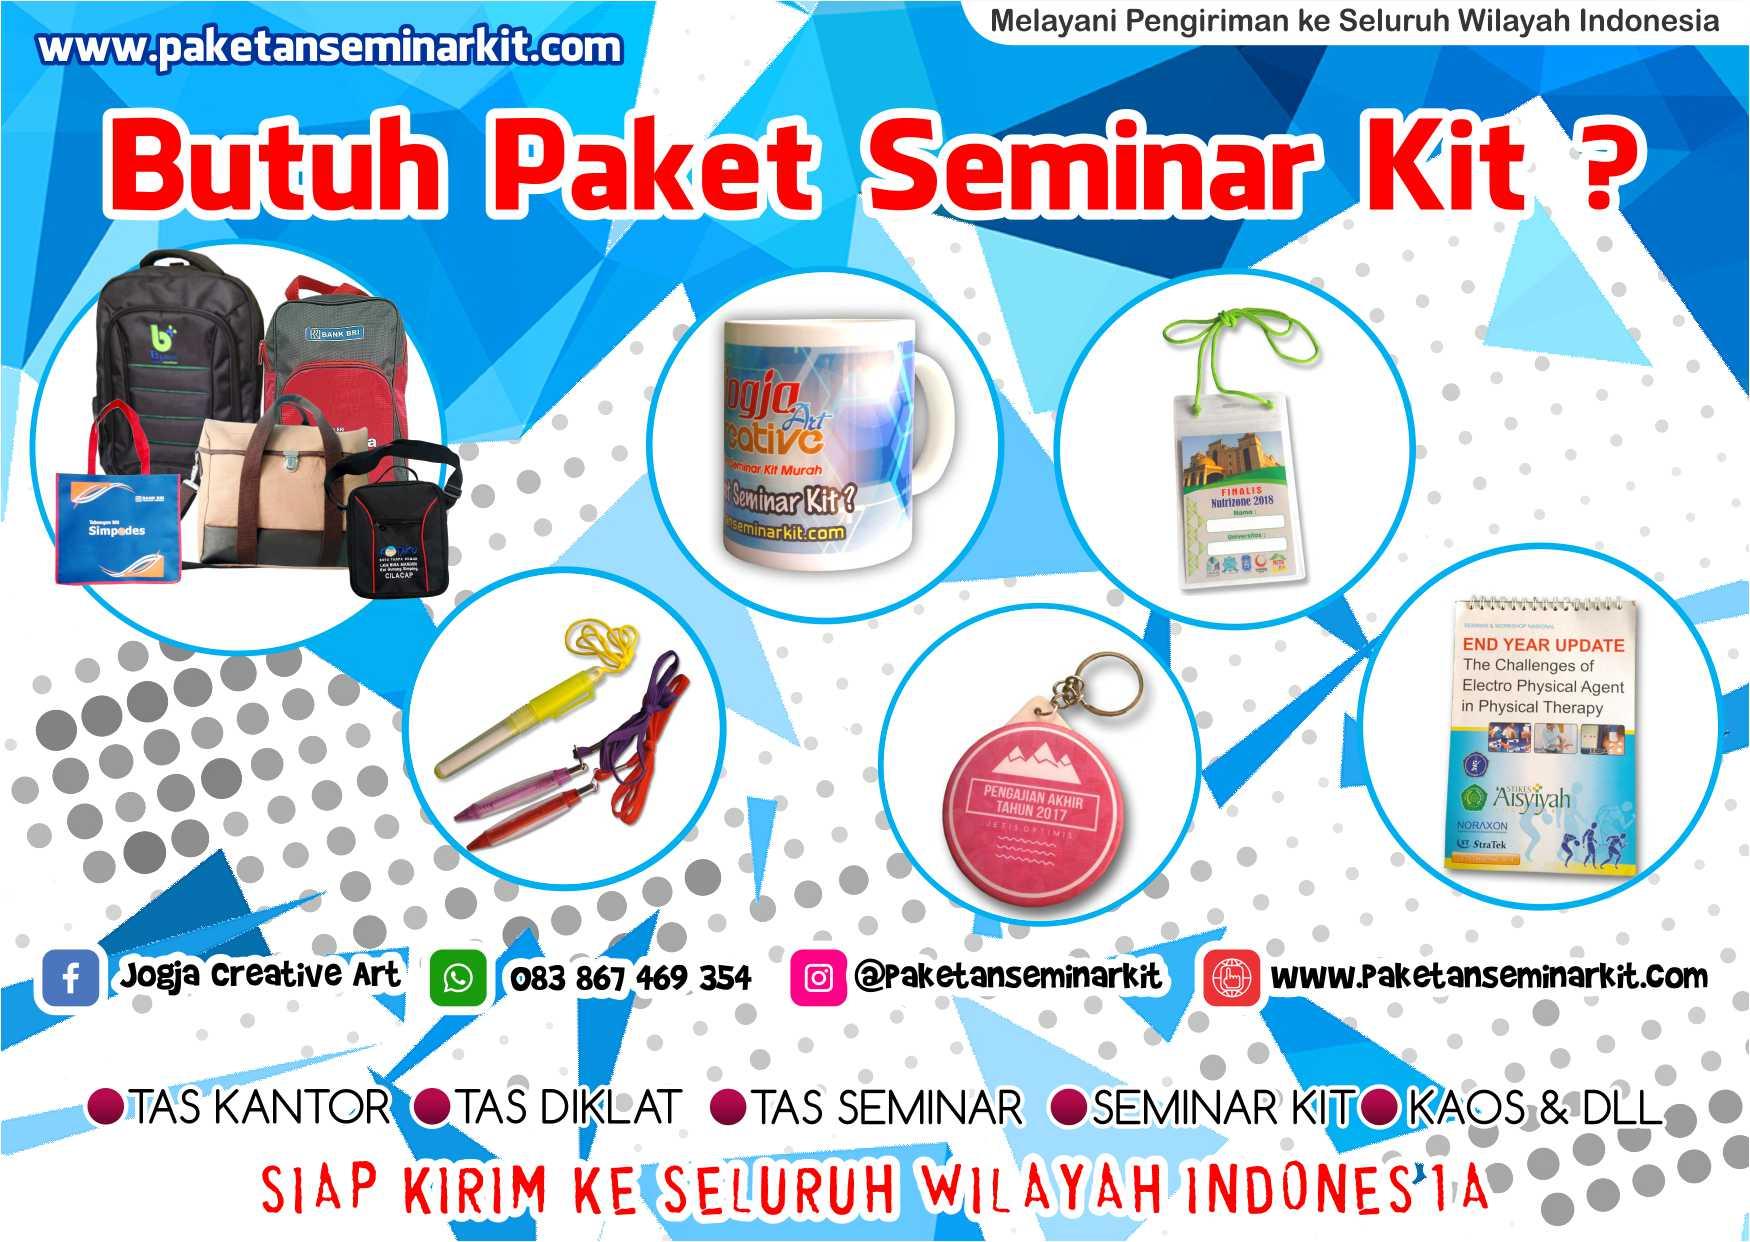 Produsen Paket Seminar Kit dan Tas Seminar Murah Makassar